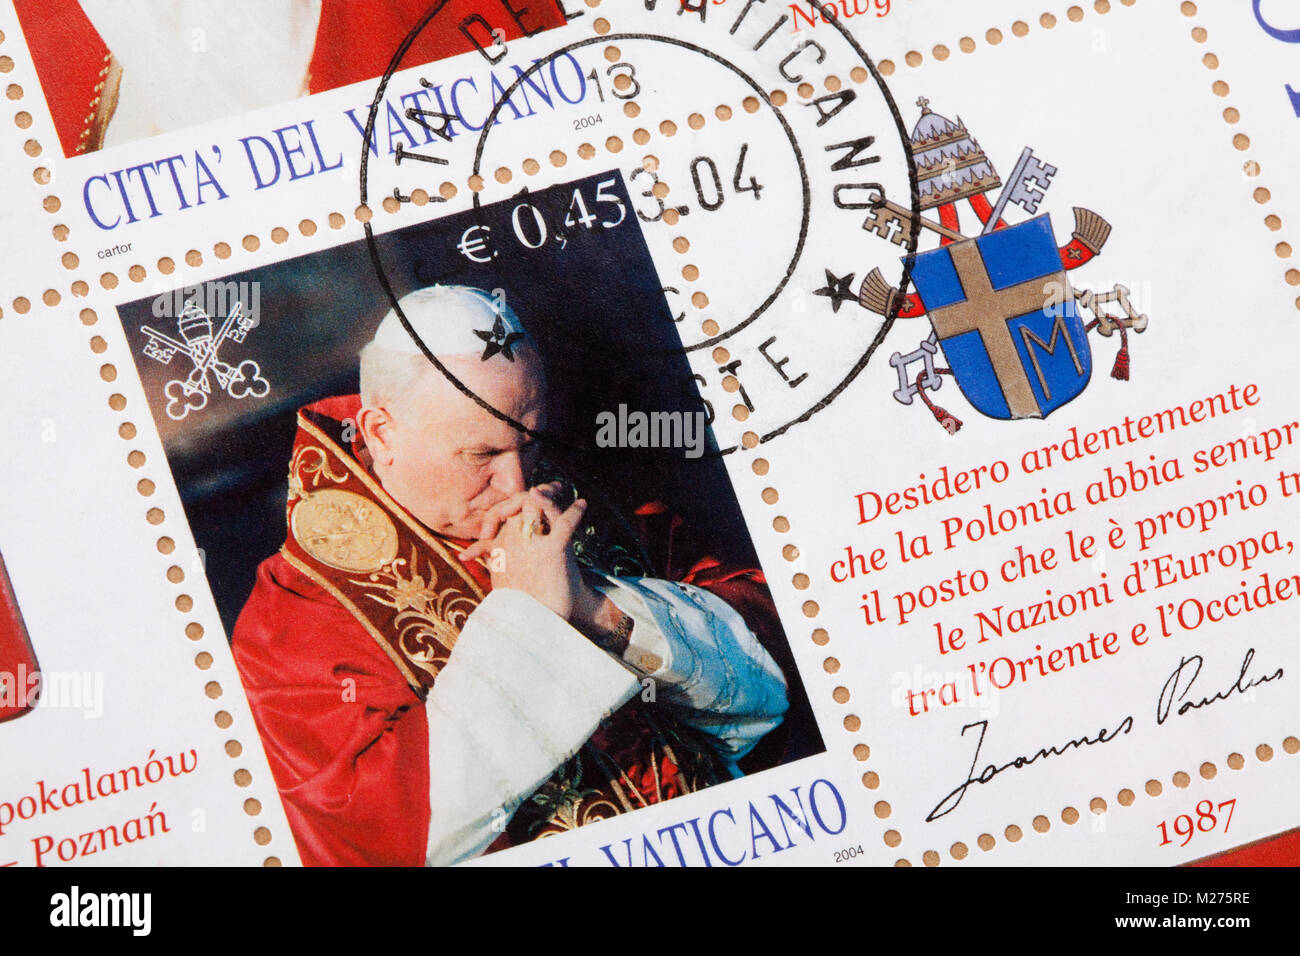 Stamps from the Vatican on a letter, Stamped, Vatican, Italy, Europe, Gestempelte Briefmarken aus dem Vatikan, Johannes - Stock Image